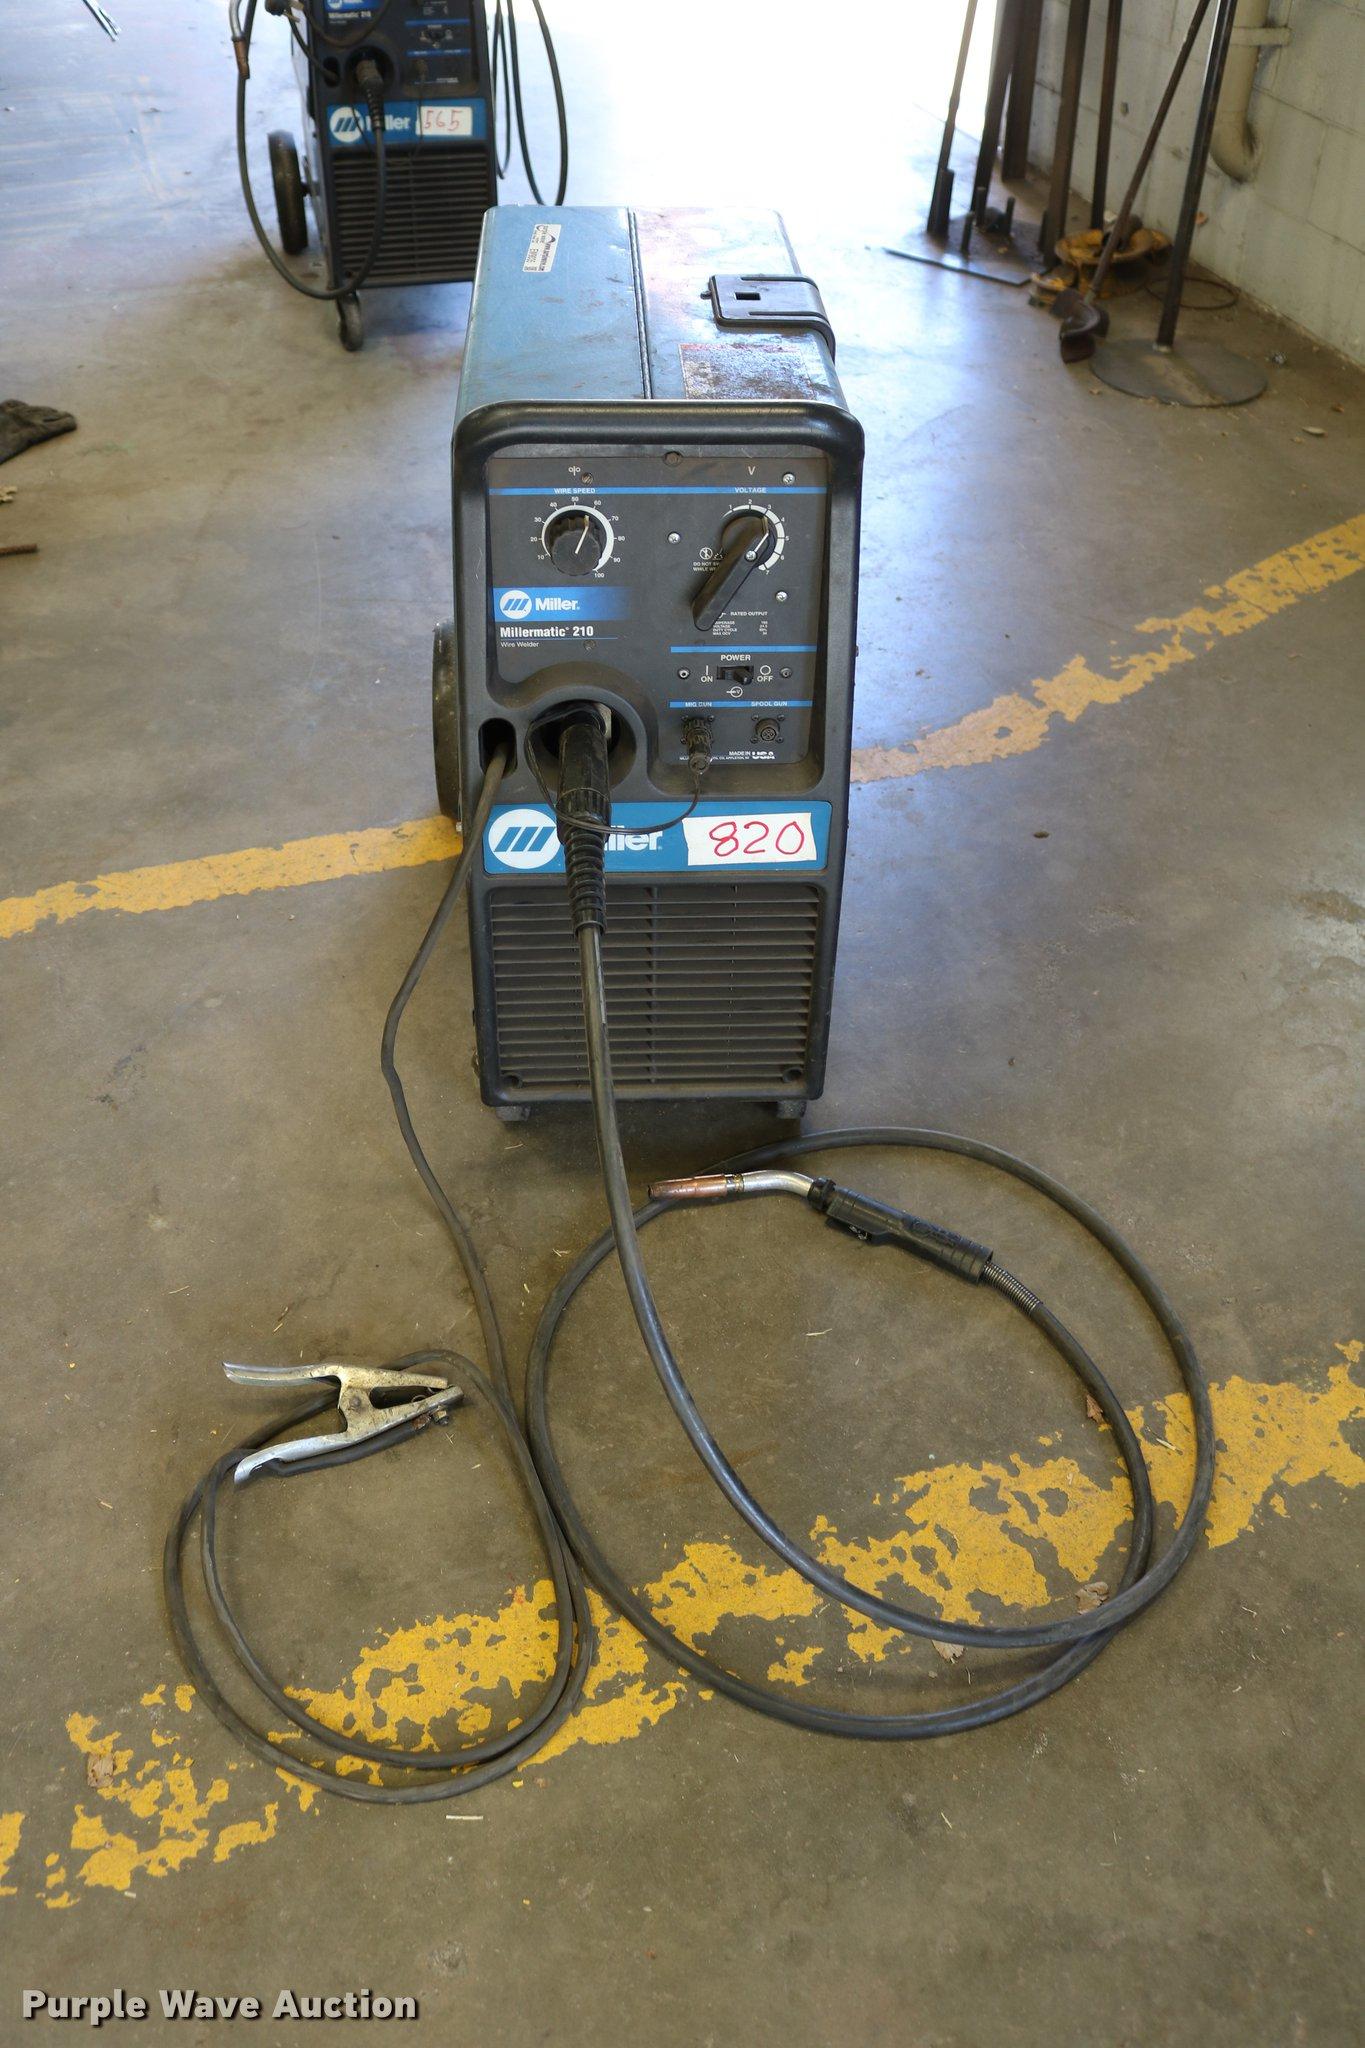 Miller Millermatic 210 Mig Wire Welder Item Ew9035 Sold Tig Plasma Machine Replacement Parts Image For